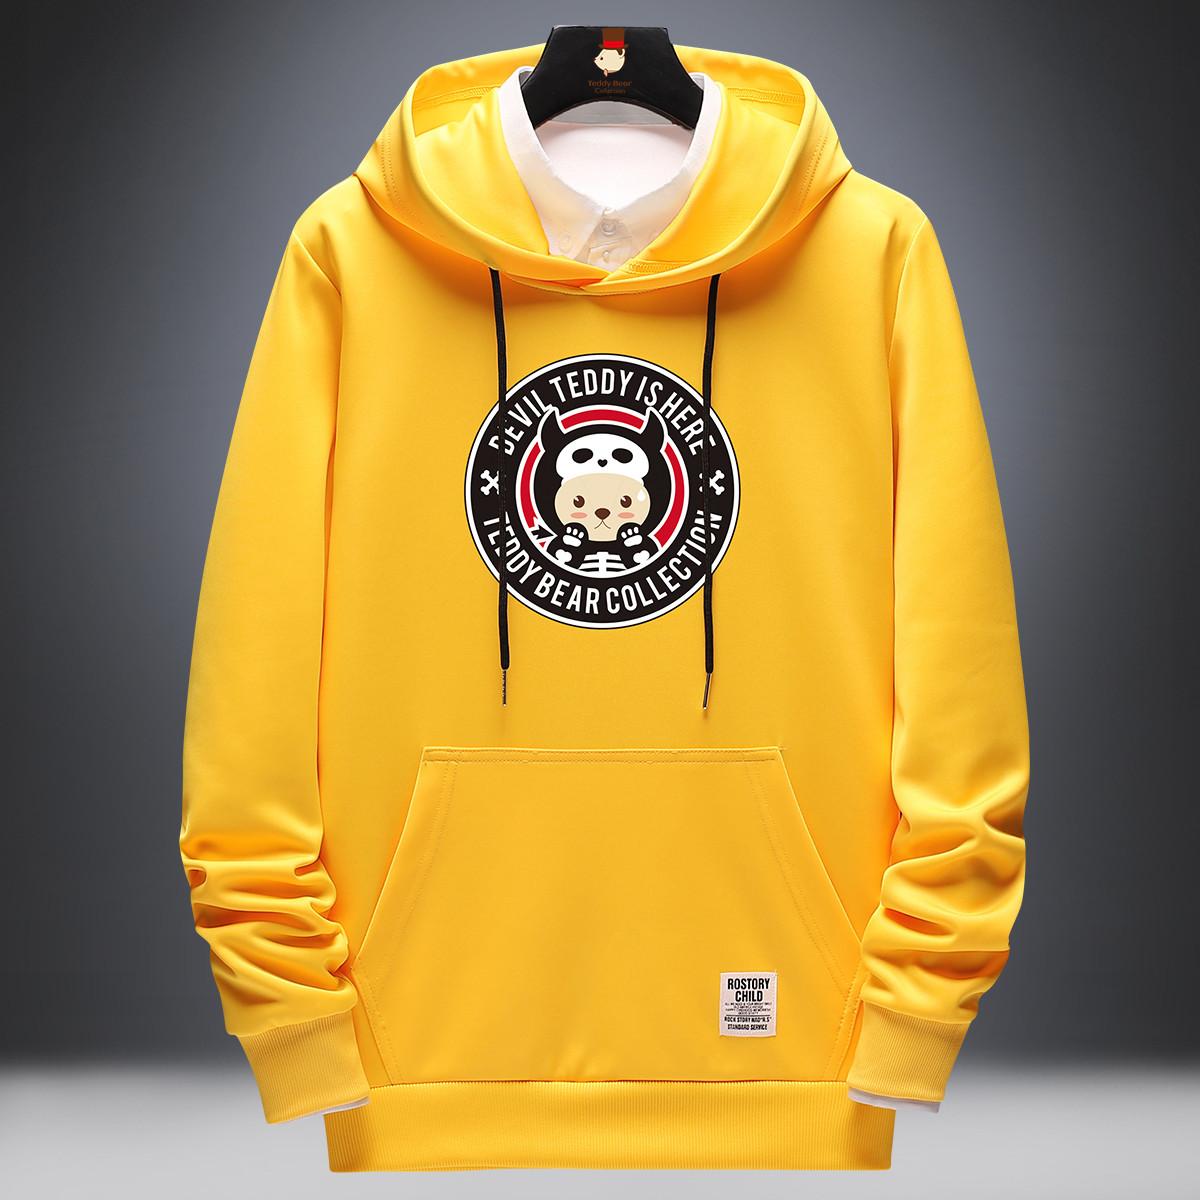 Teddy Bear Collection 泰迪先生系列卫衣 卡通印花卫衣 连帽休闲运动卫衣男